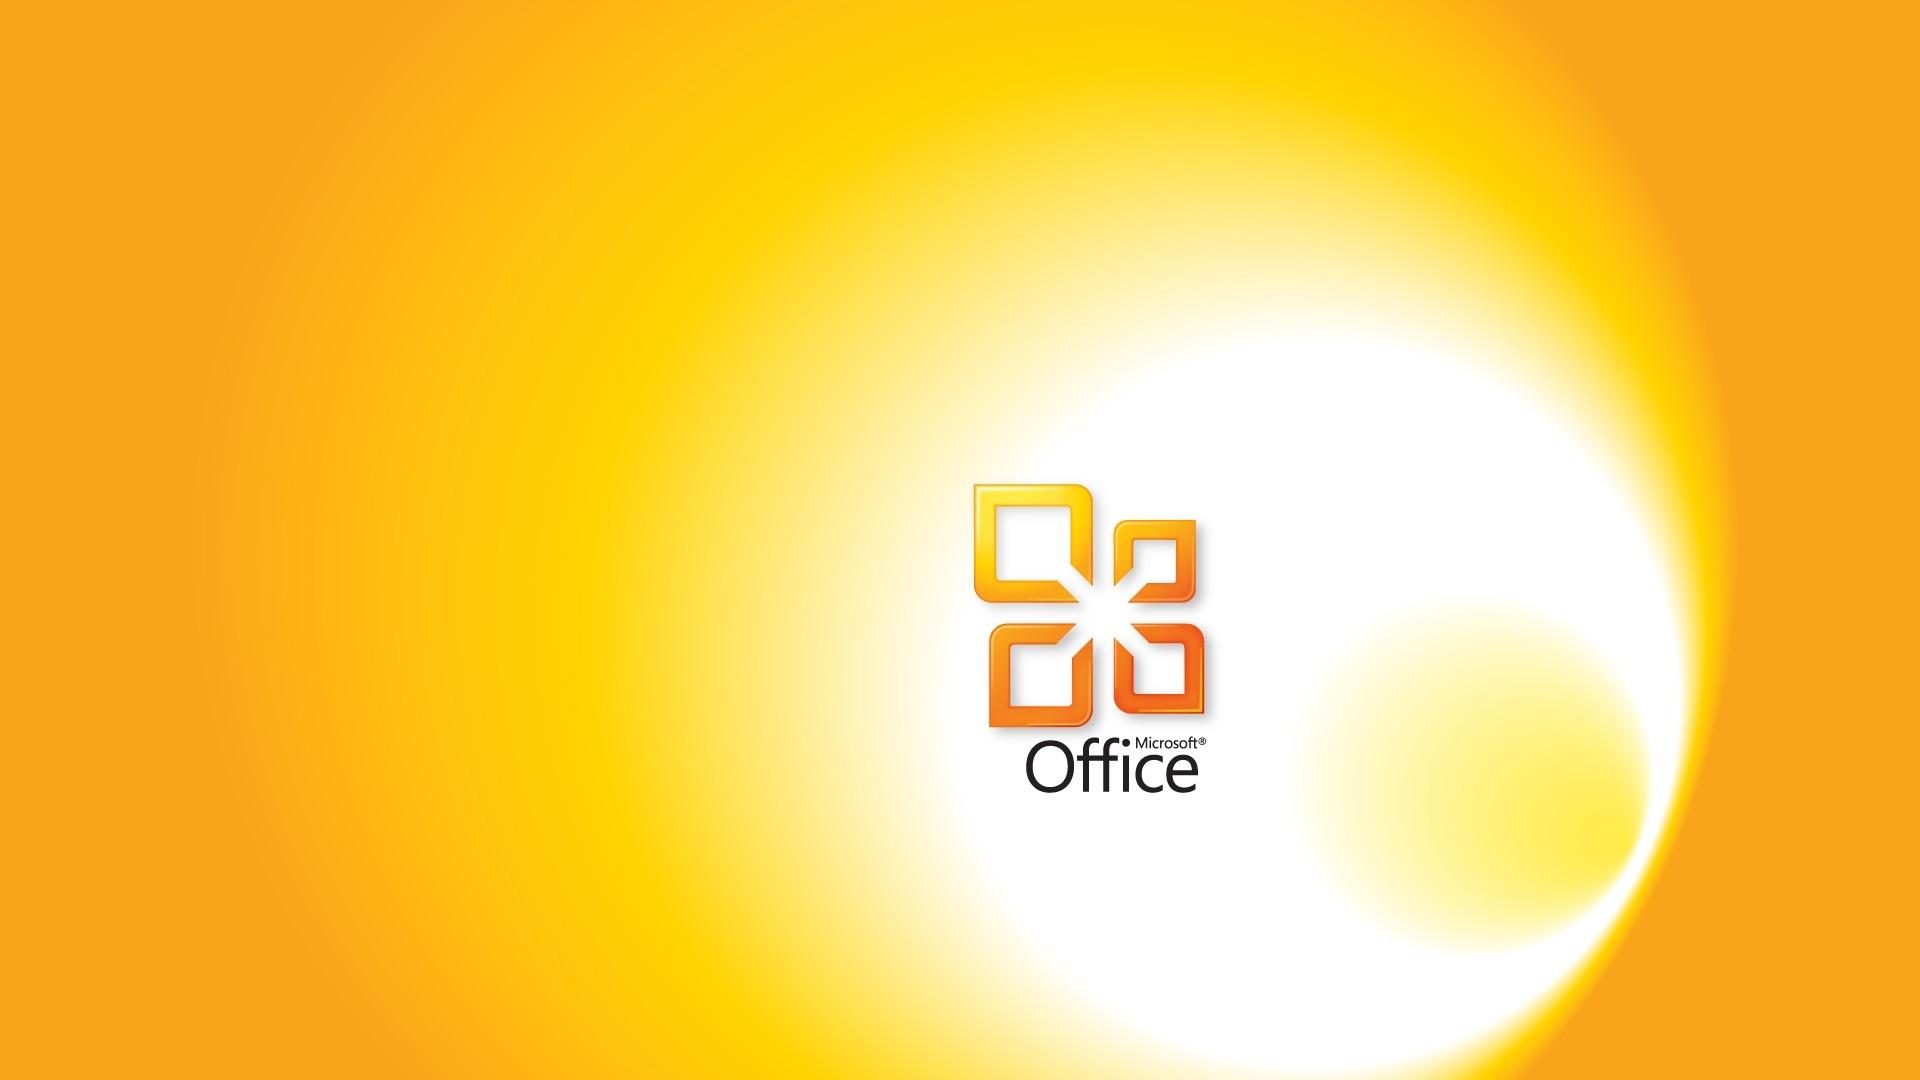 Wallpaper Microsoft, Office, Yellow, White, Program